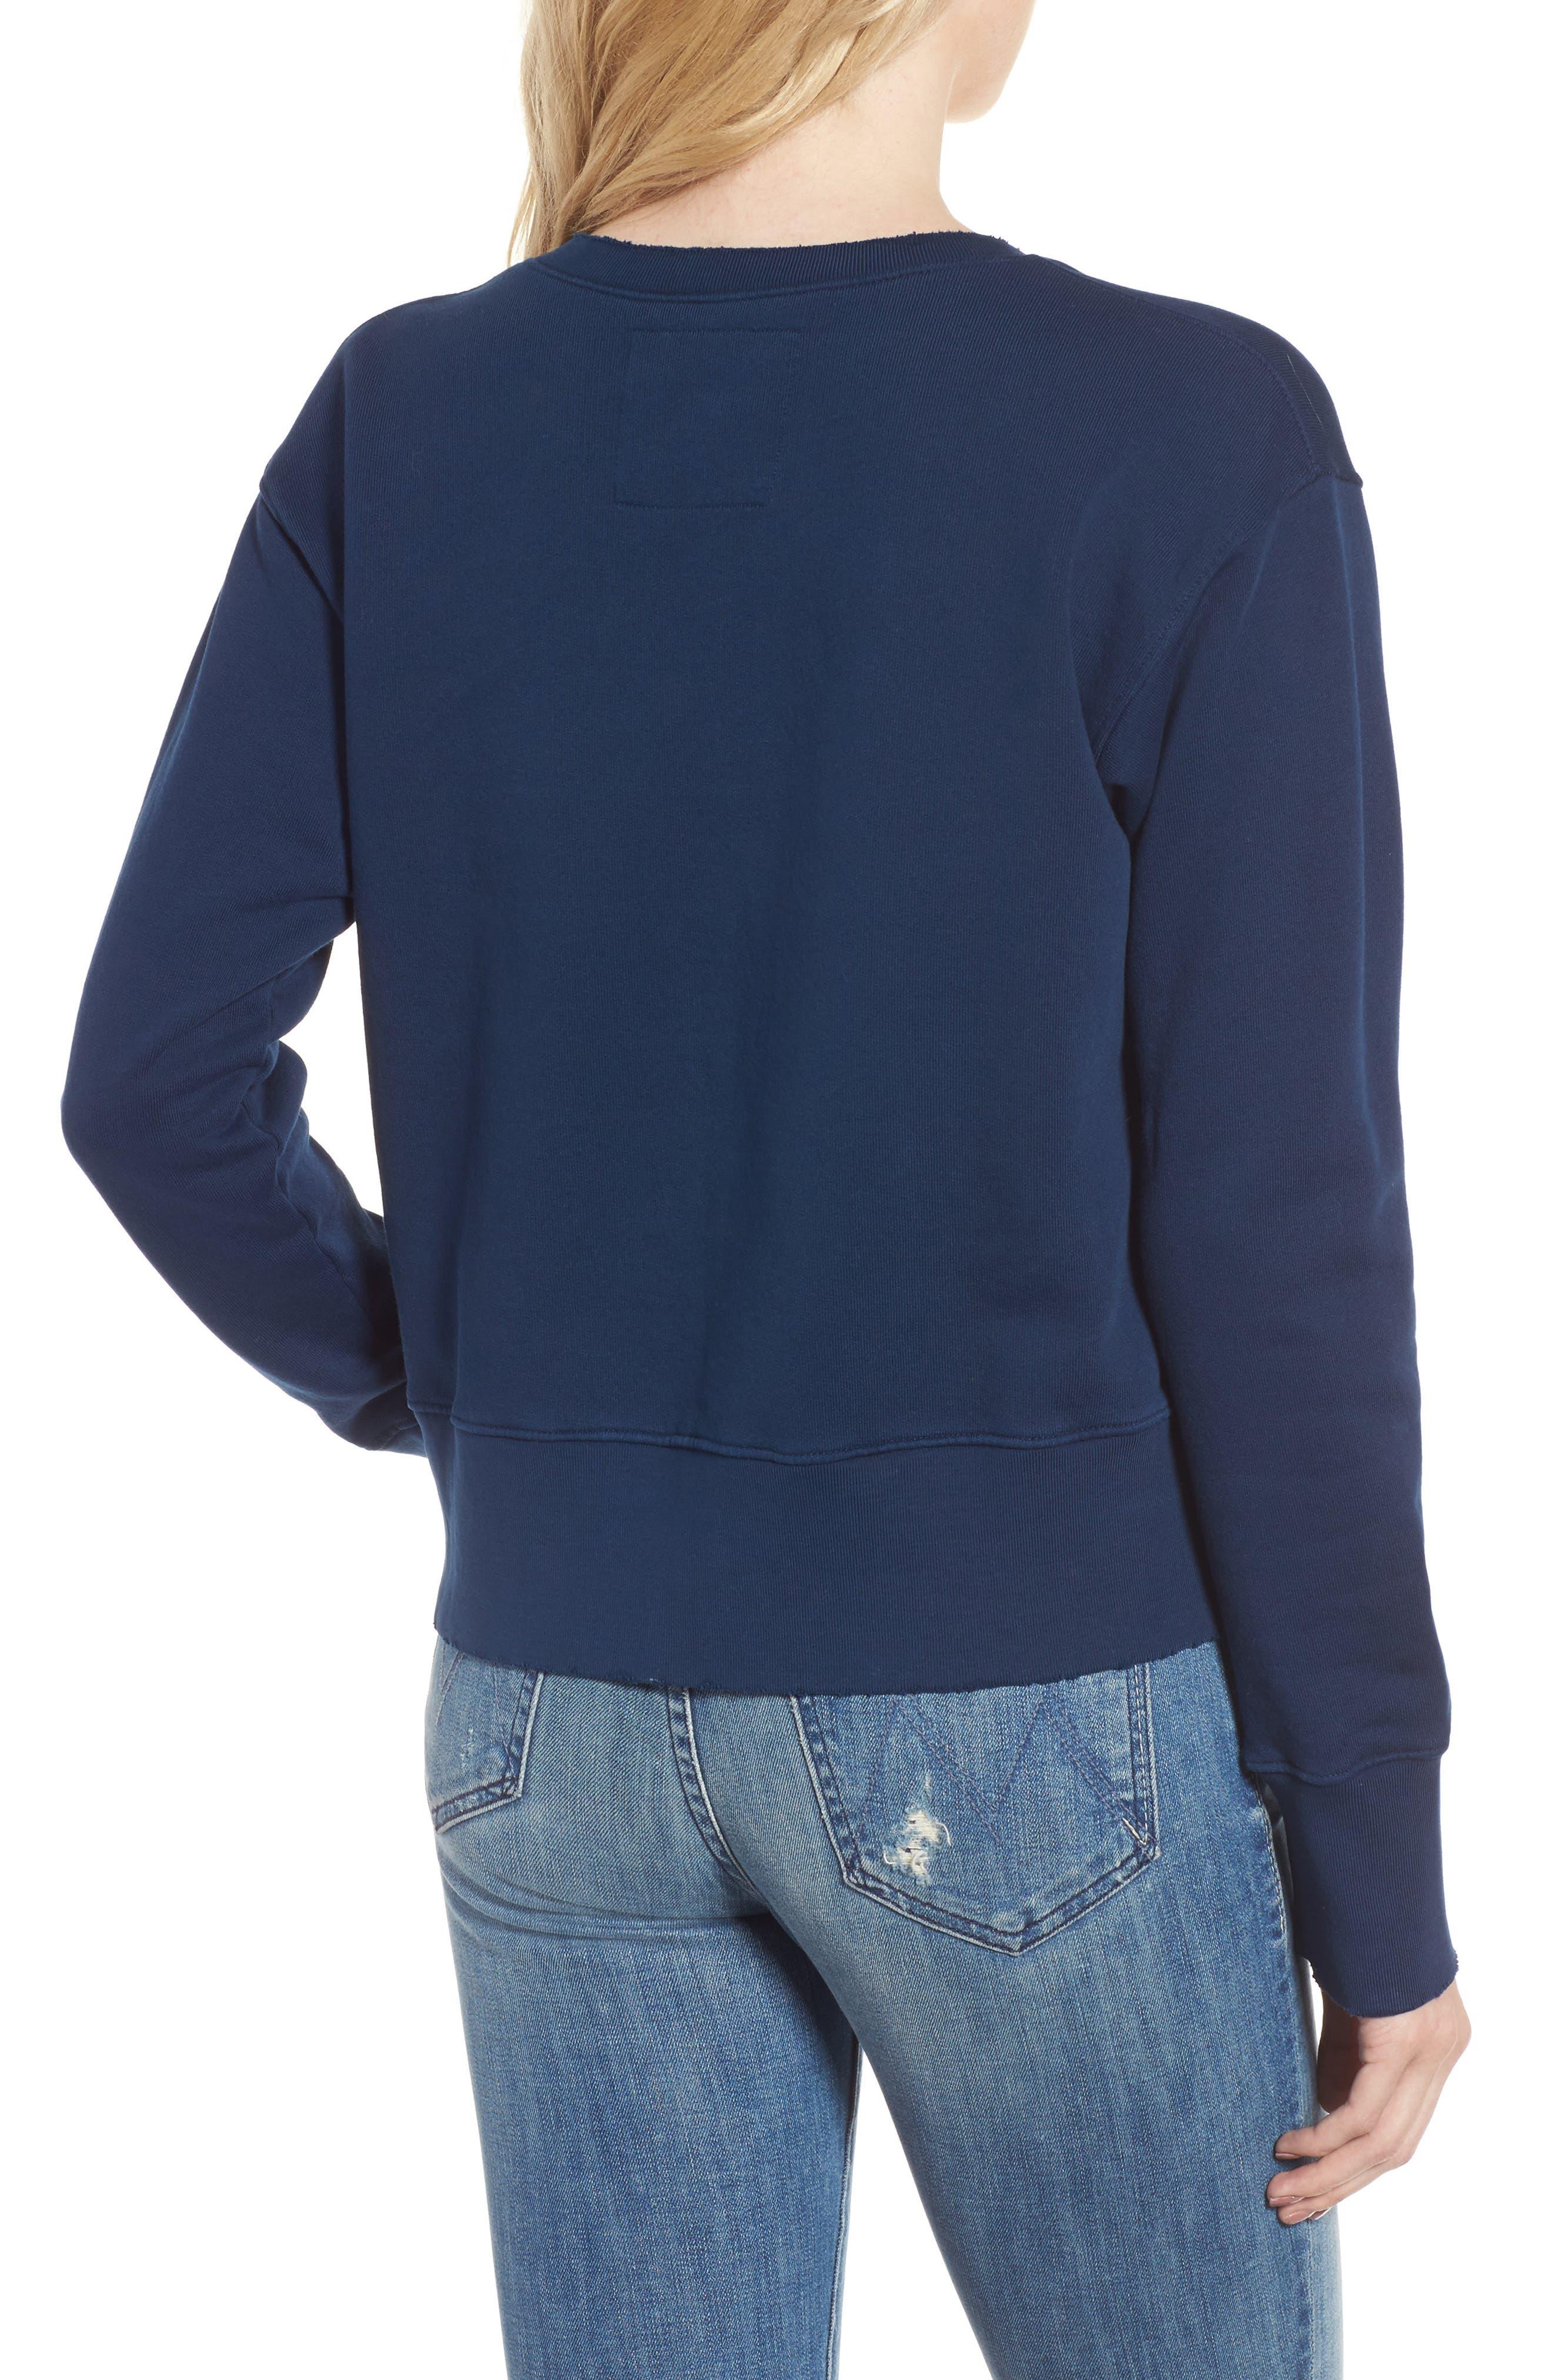 Distressed Sweatshirt,                             Alternate thumbnail 2, color,                             Blazer